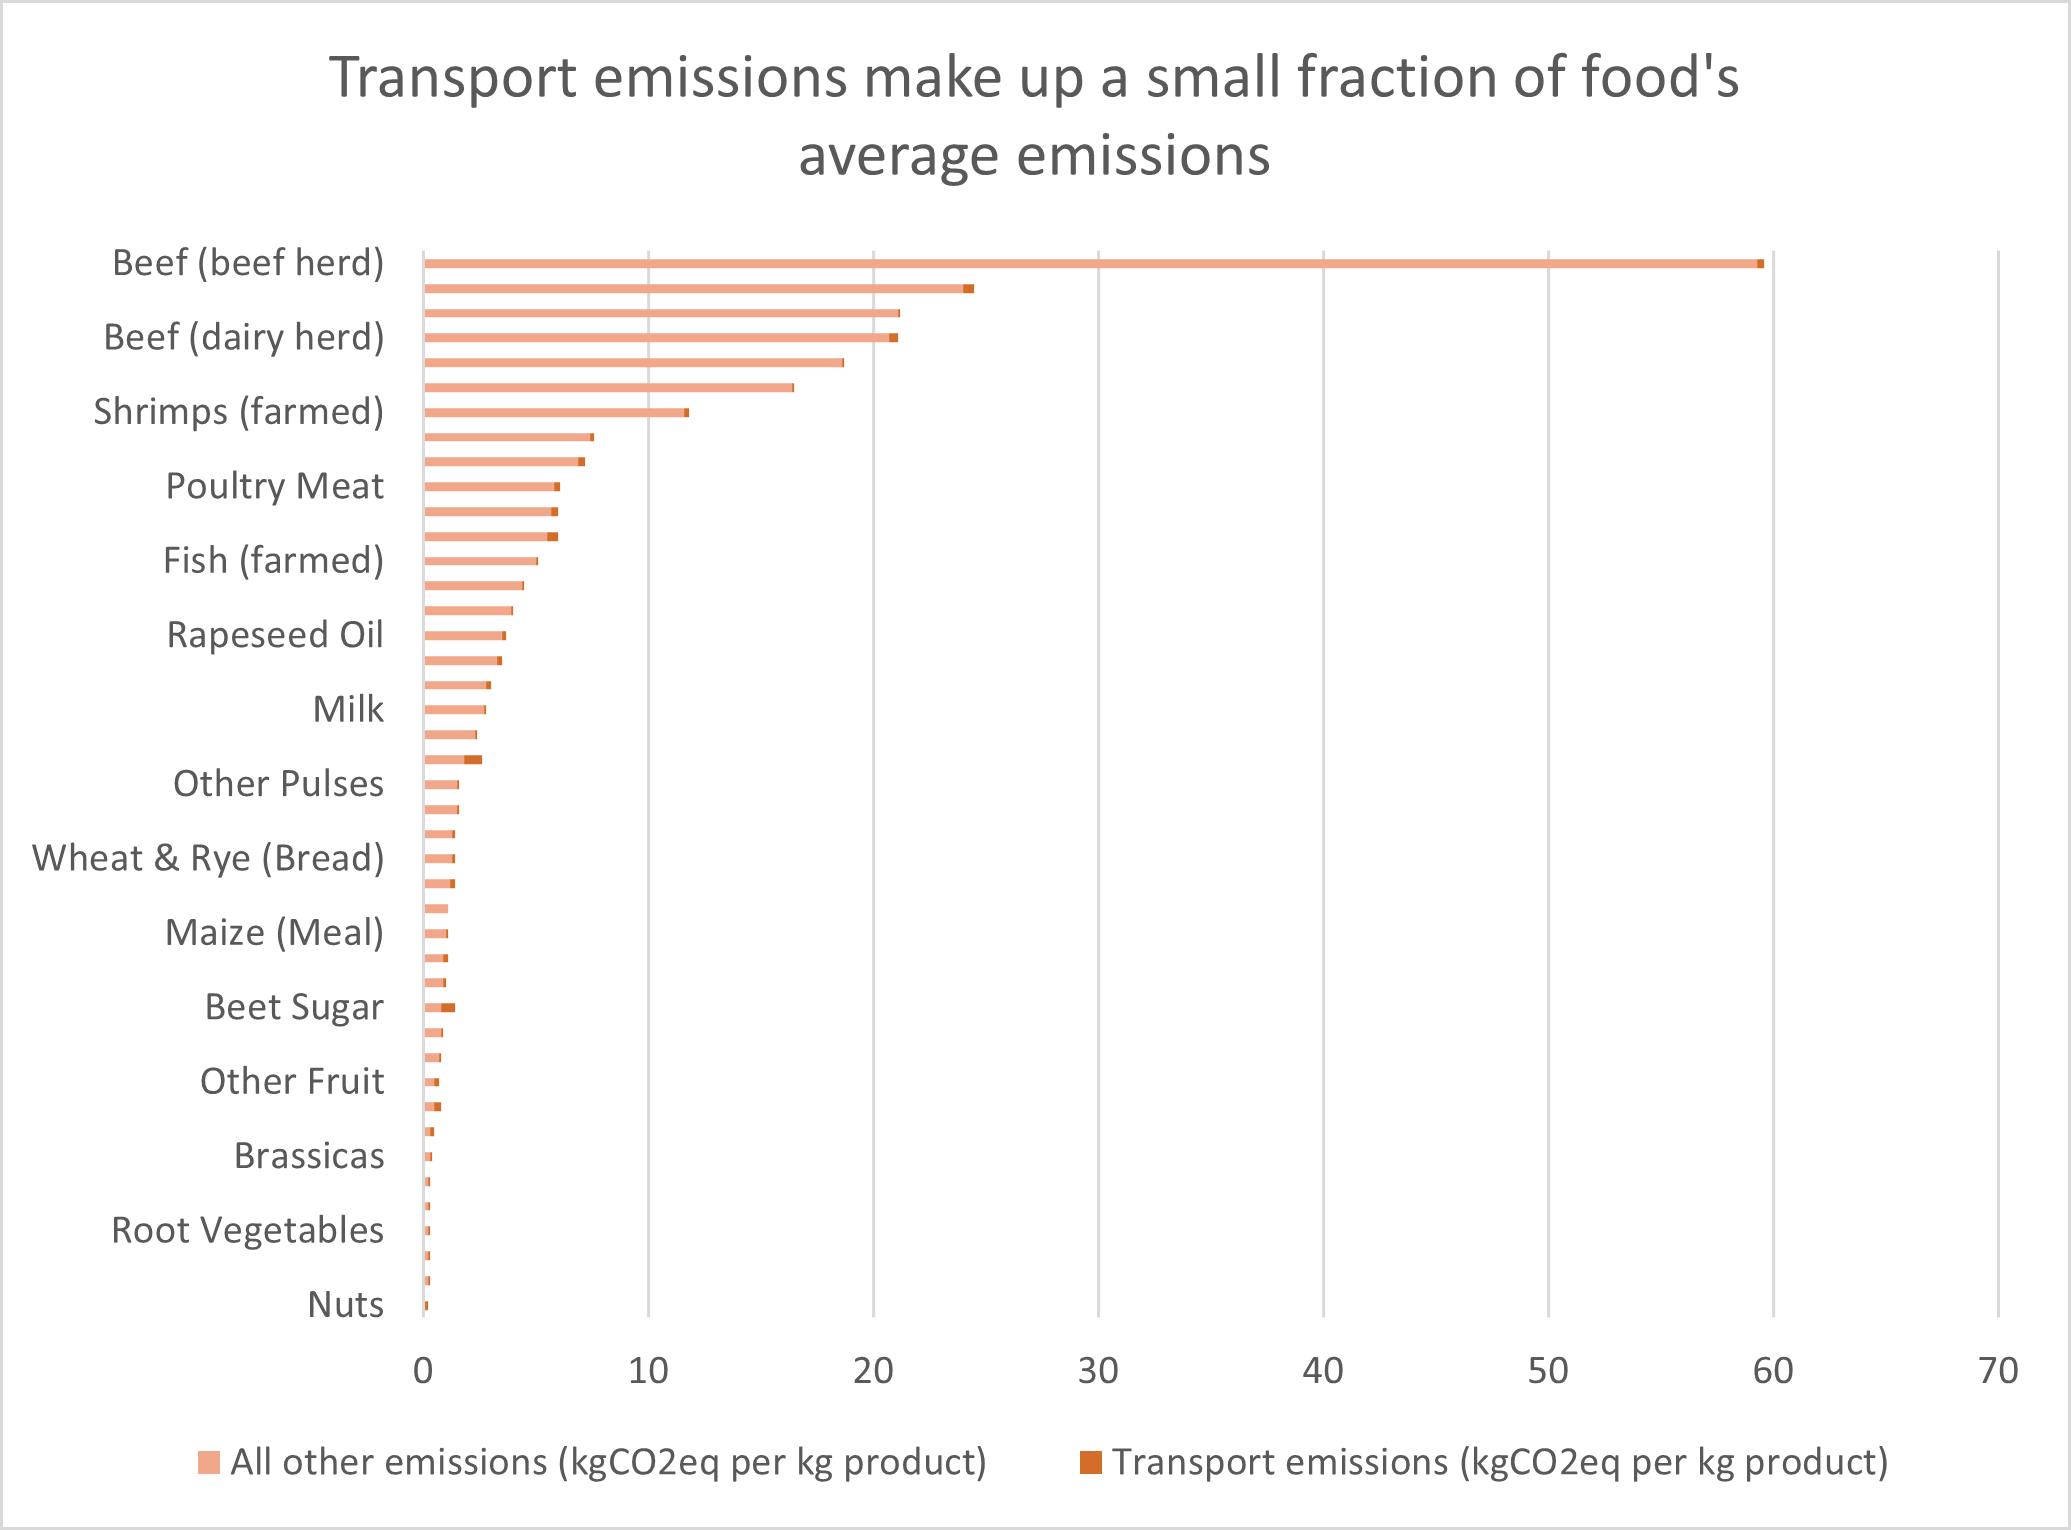 figure: transport emissions make up a small fraction of food's average emissions